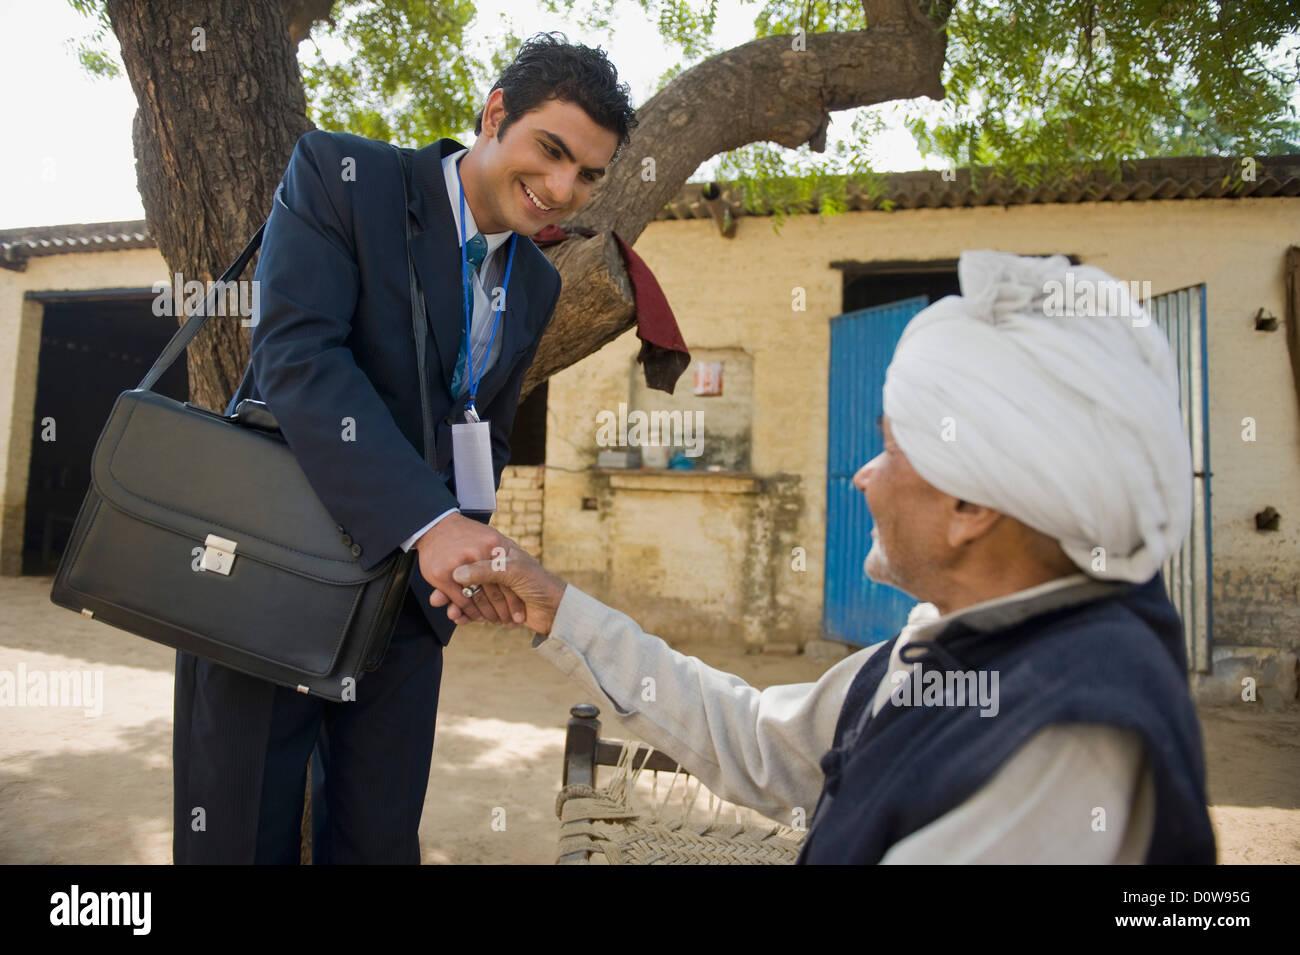 Financial advisor shaking hands with a farmer, Hasanpur, Haryana Stock  Photo - Alamy